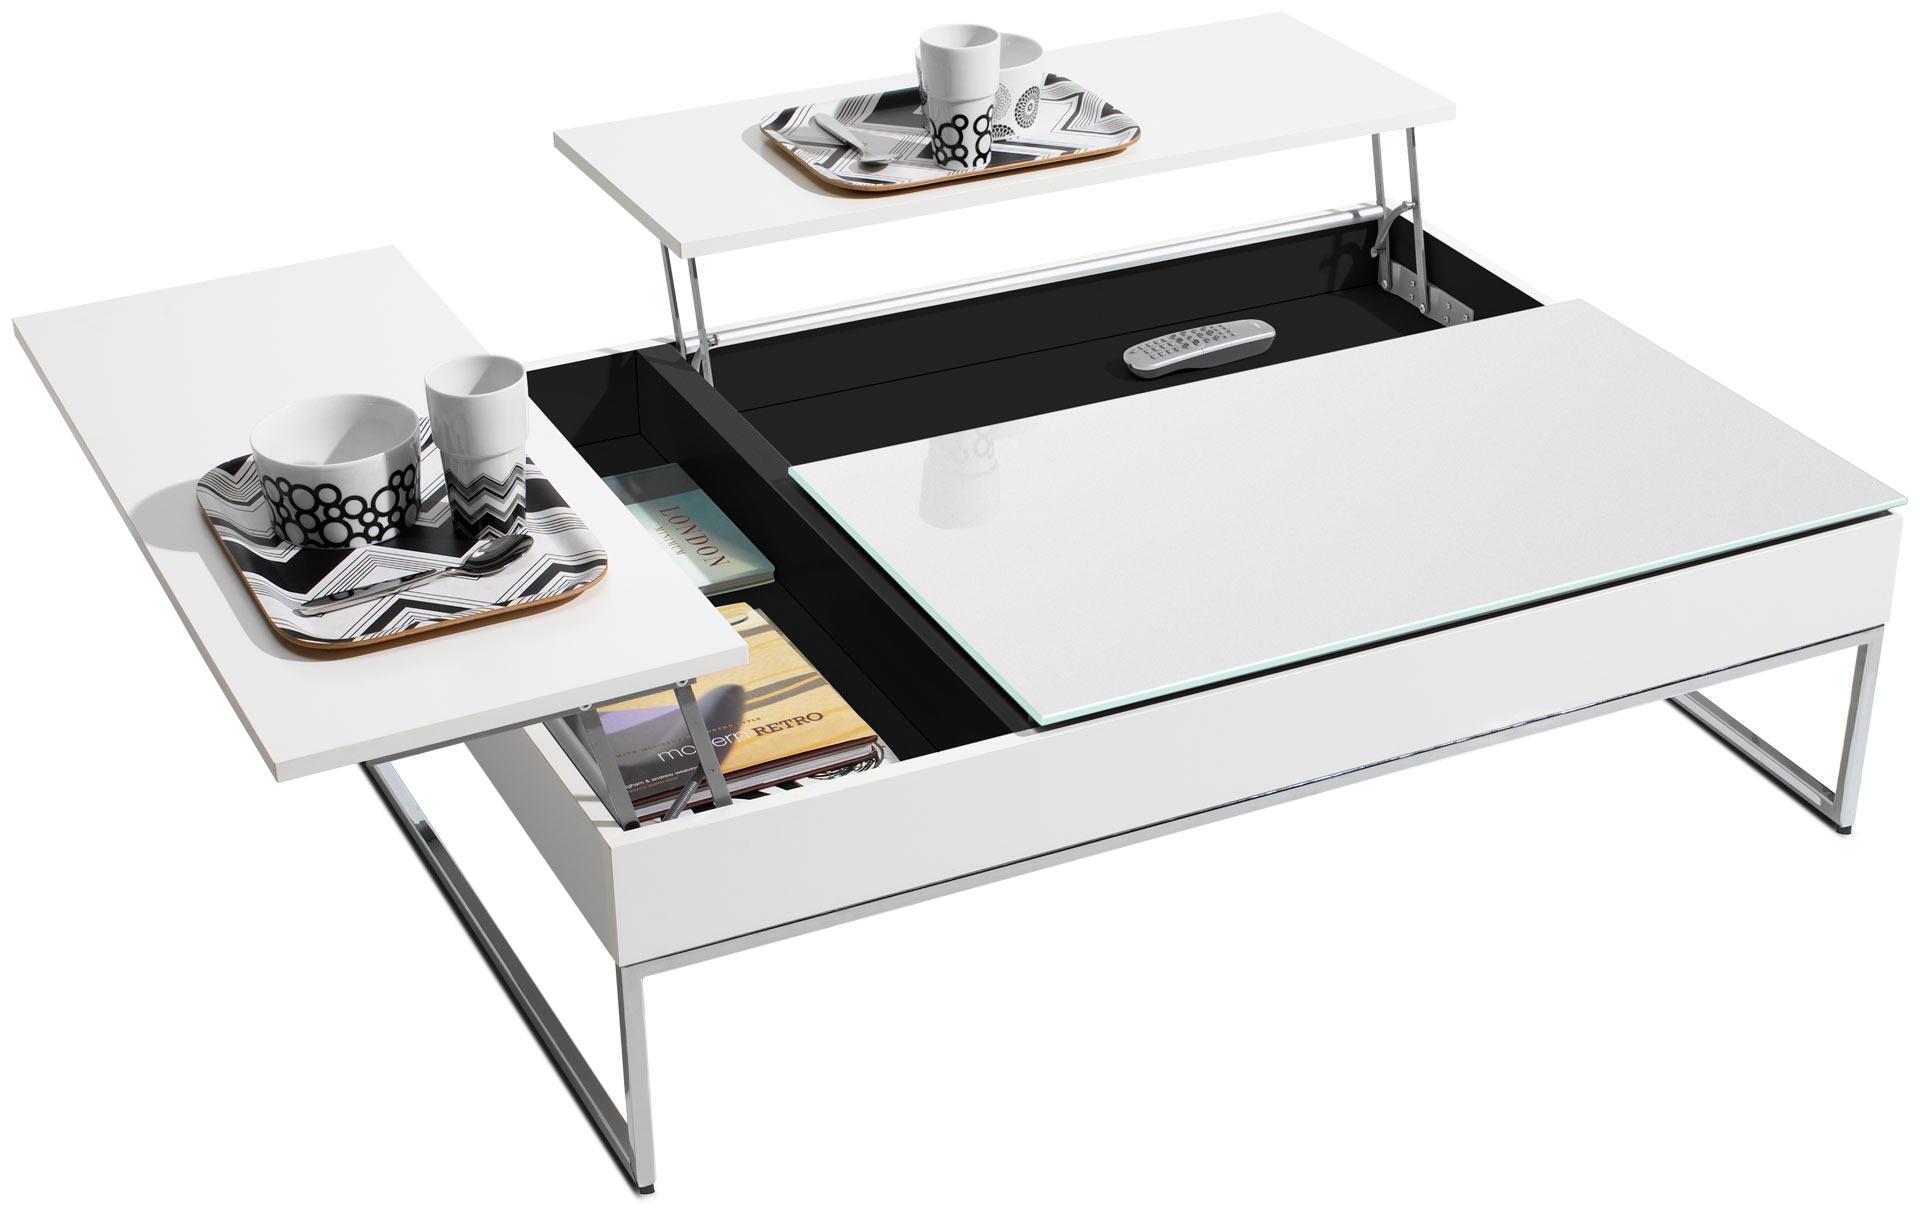 Table basse bo concept lille maison - Bo concept table basse ...